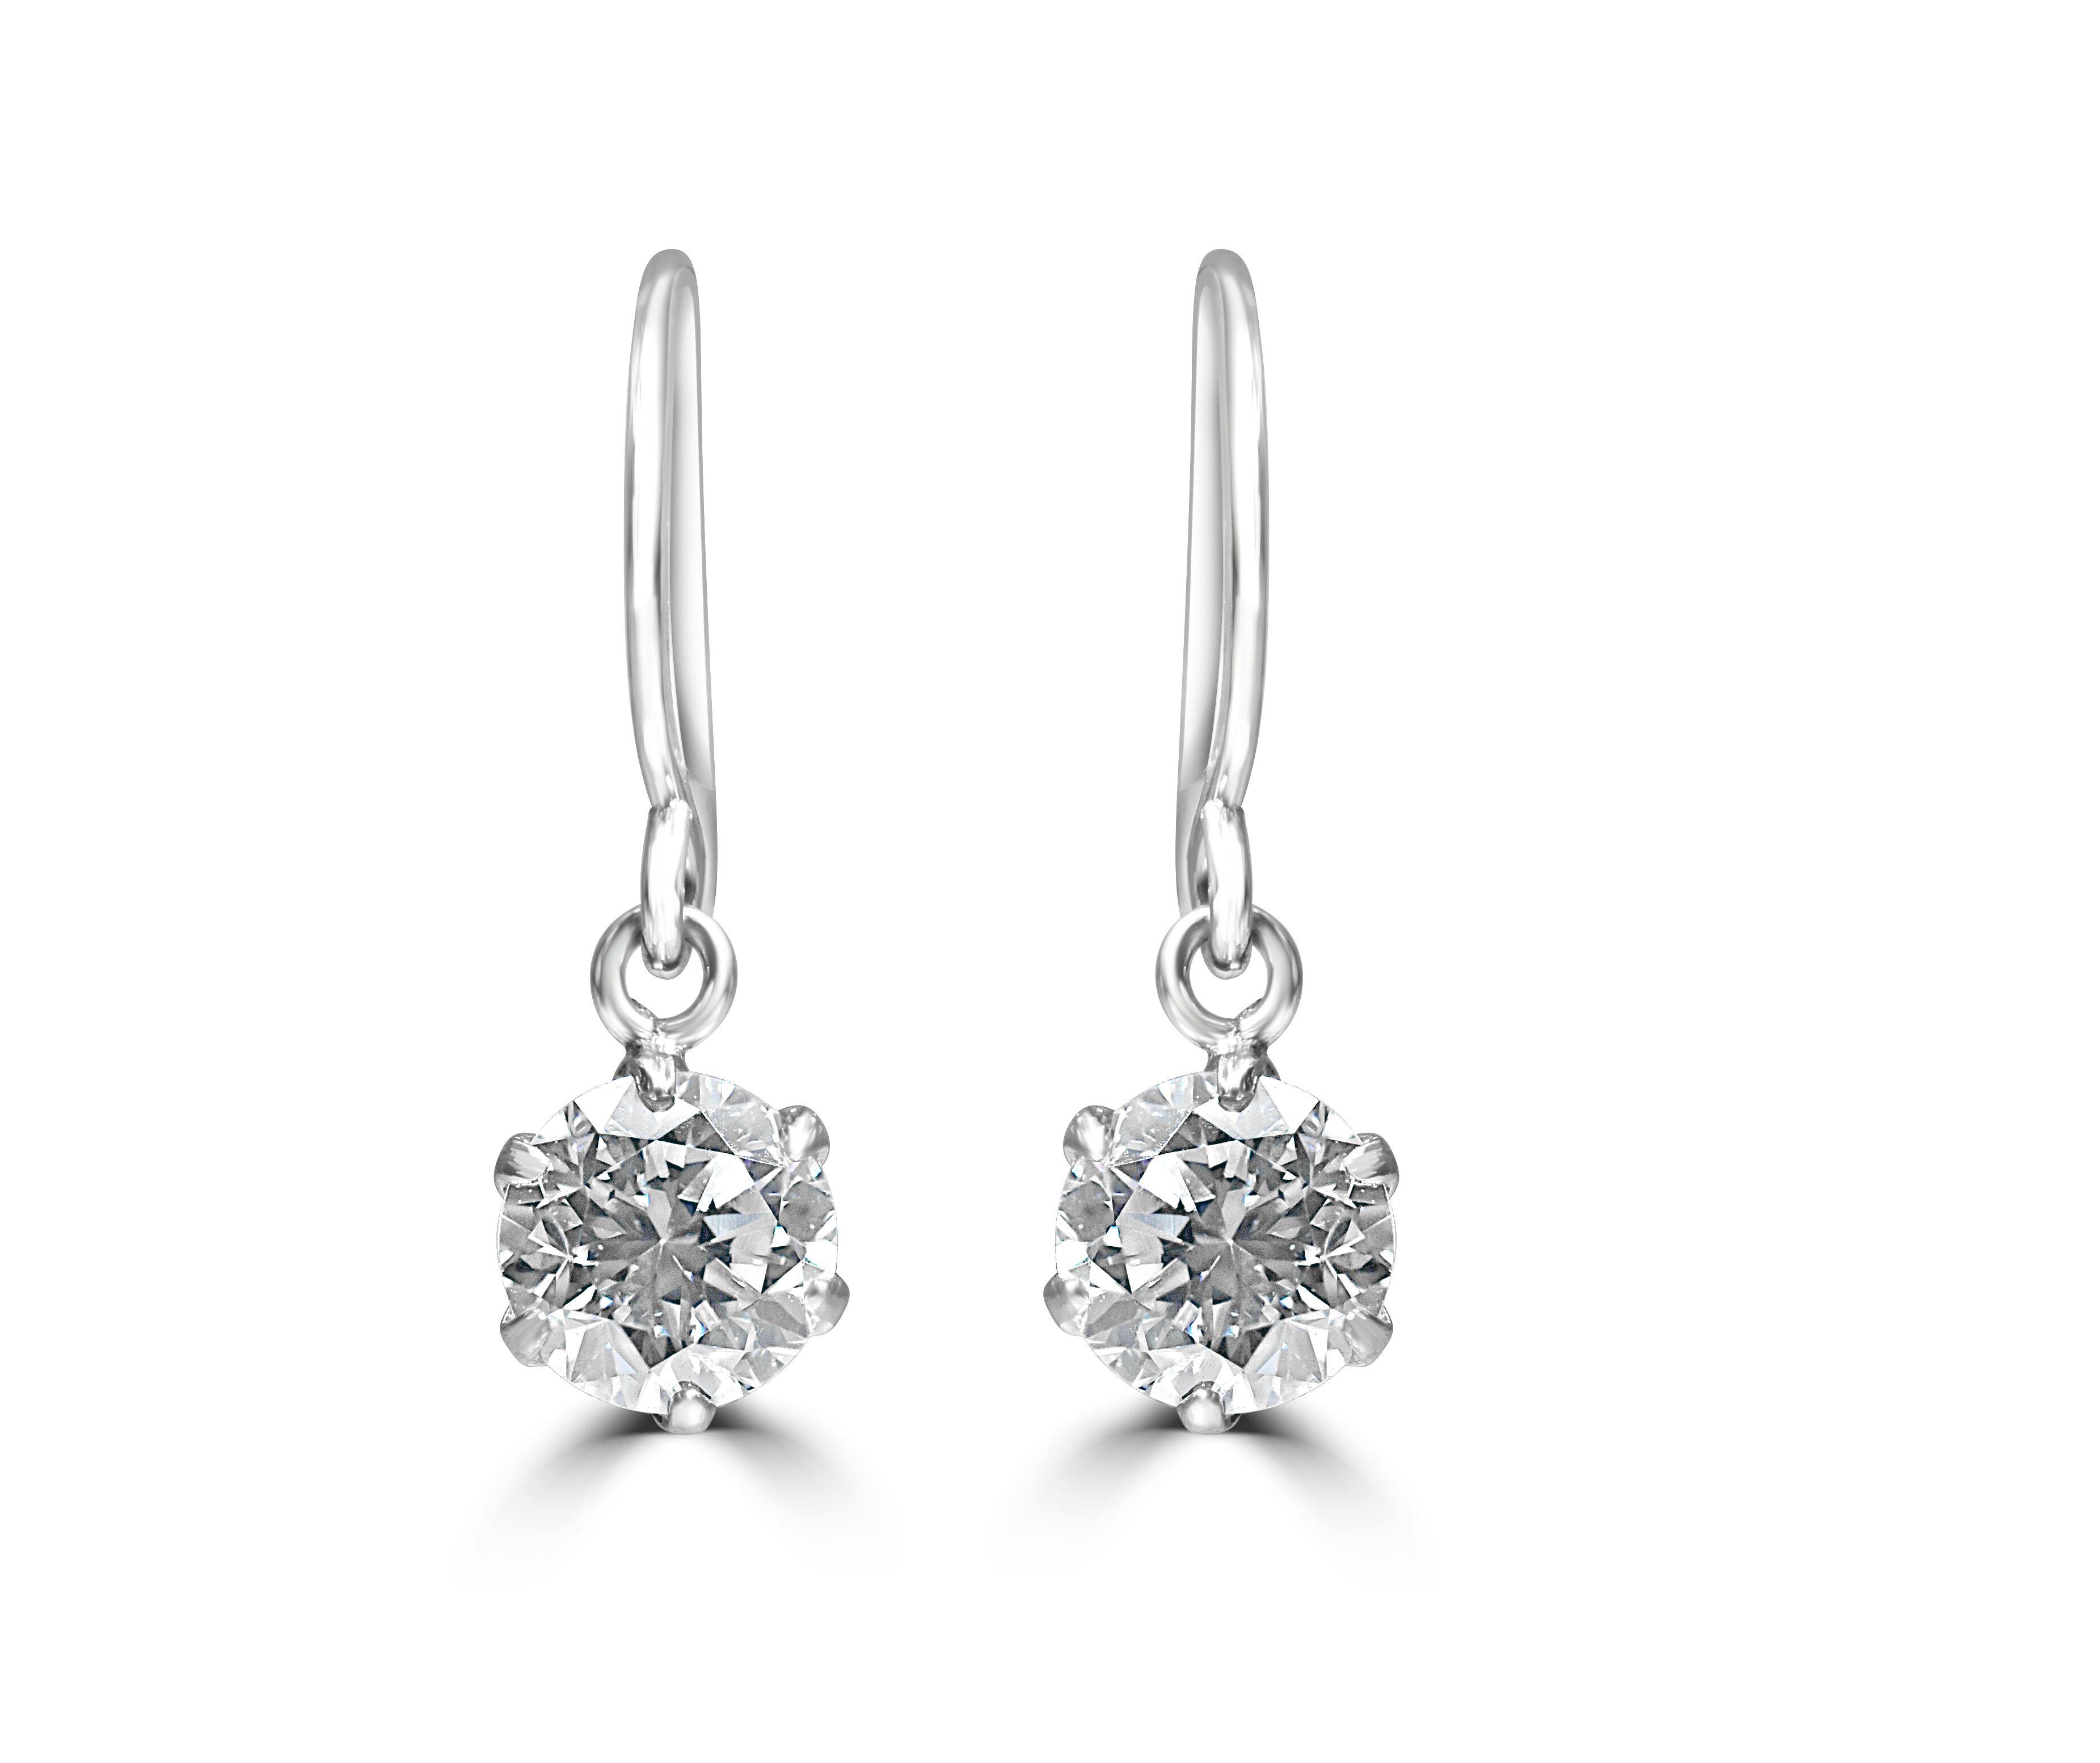 Stunning Platinum 1/2 carat tw Diamond Earrings RRP £1595